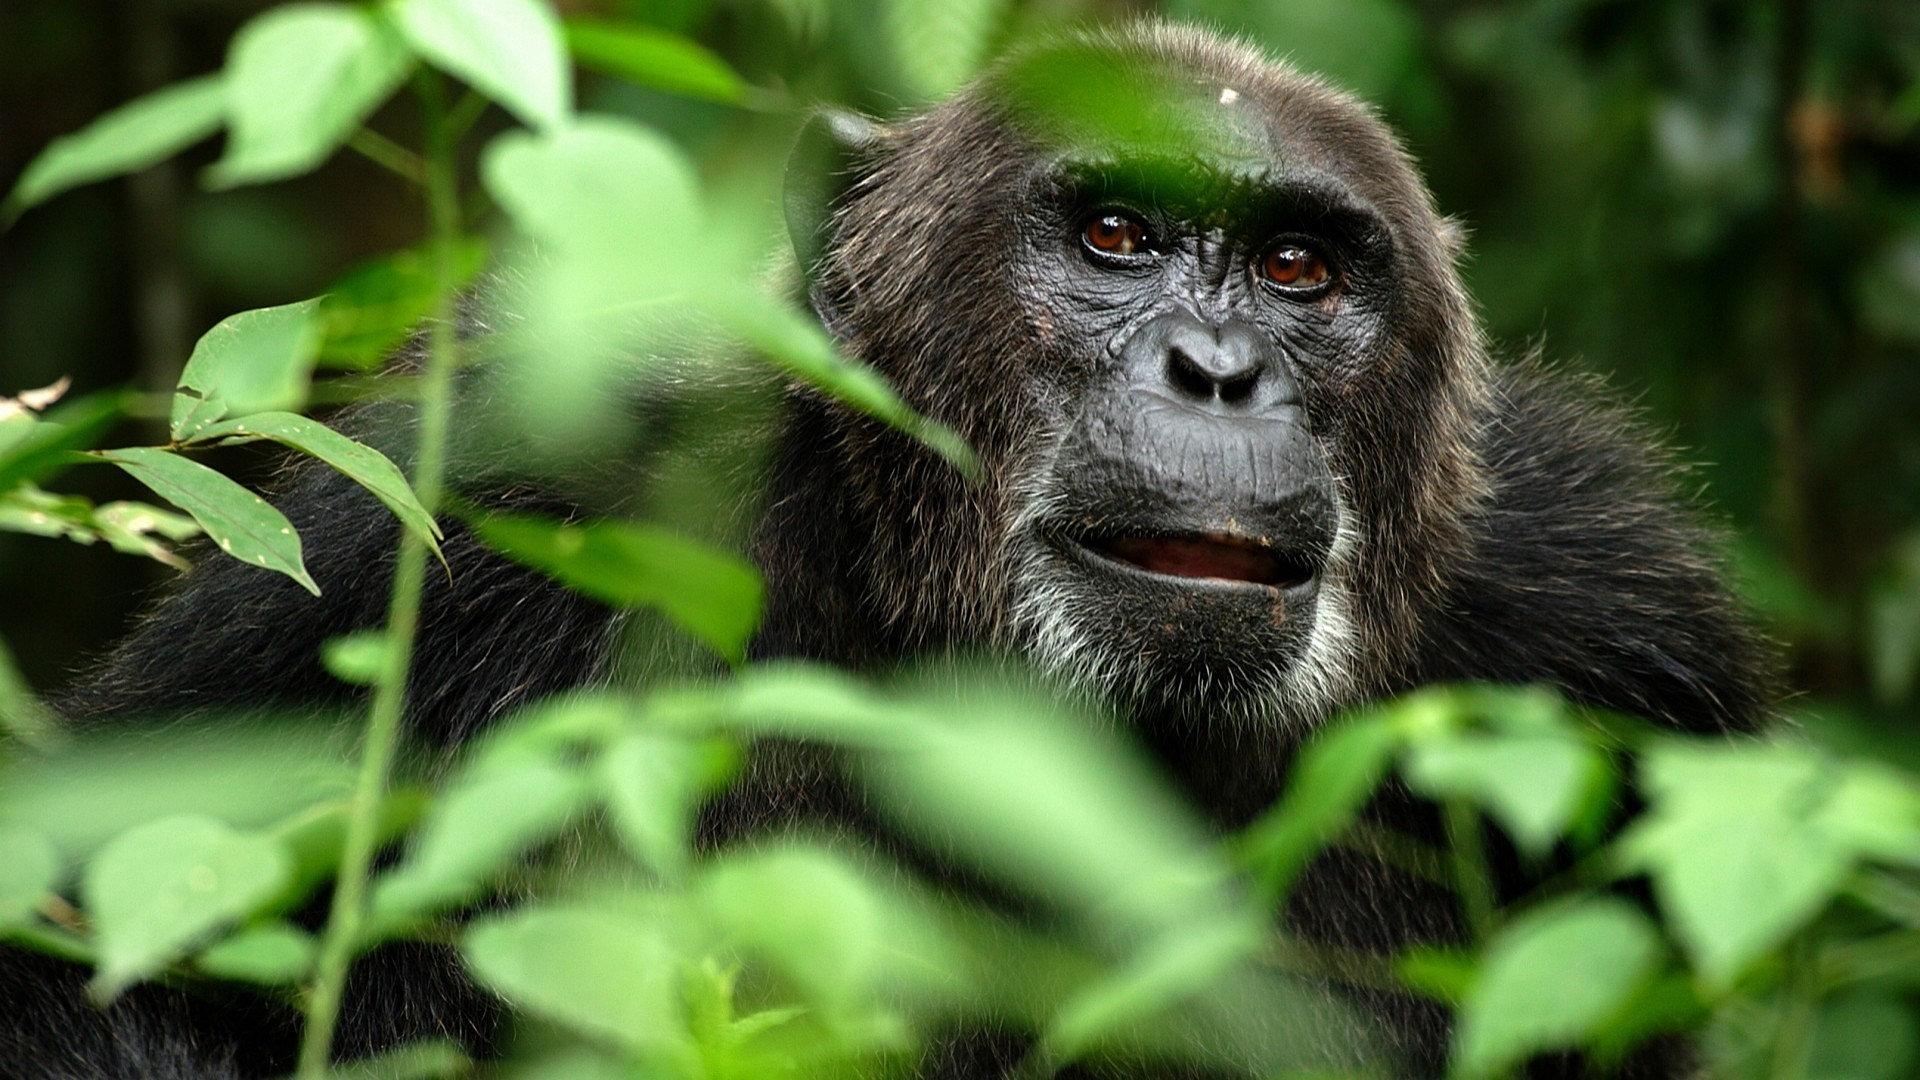 Animal   Monkey Gorilla Wallpaper 1920x1080